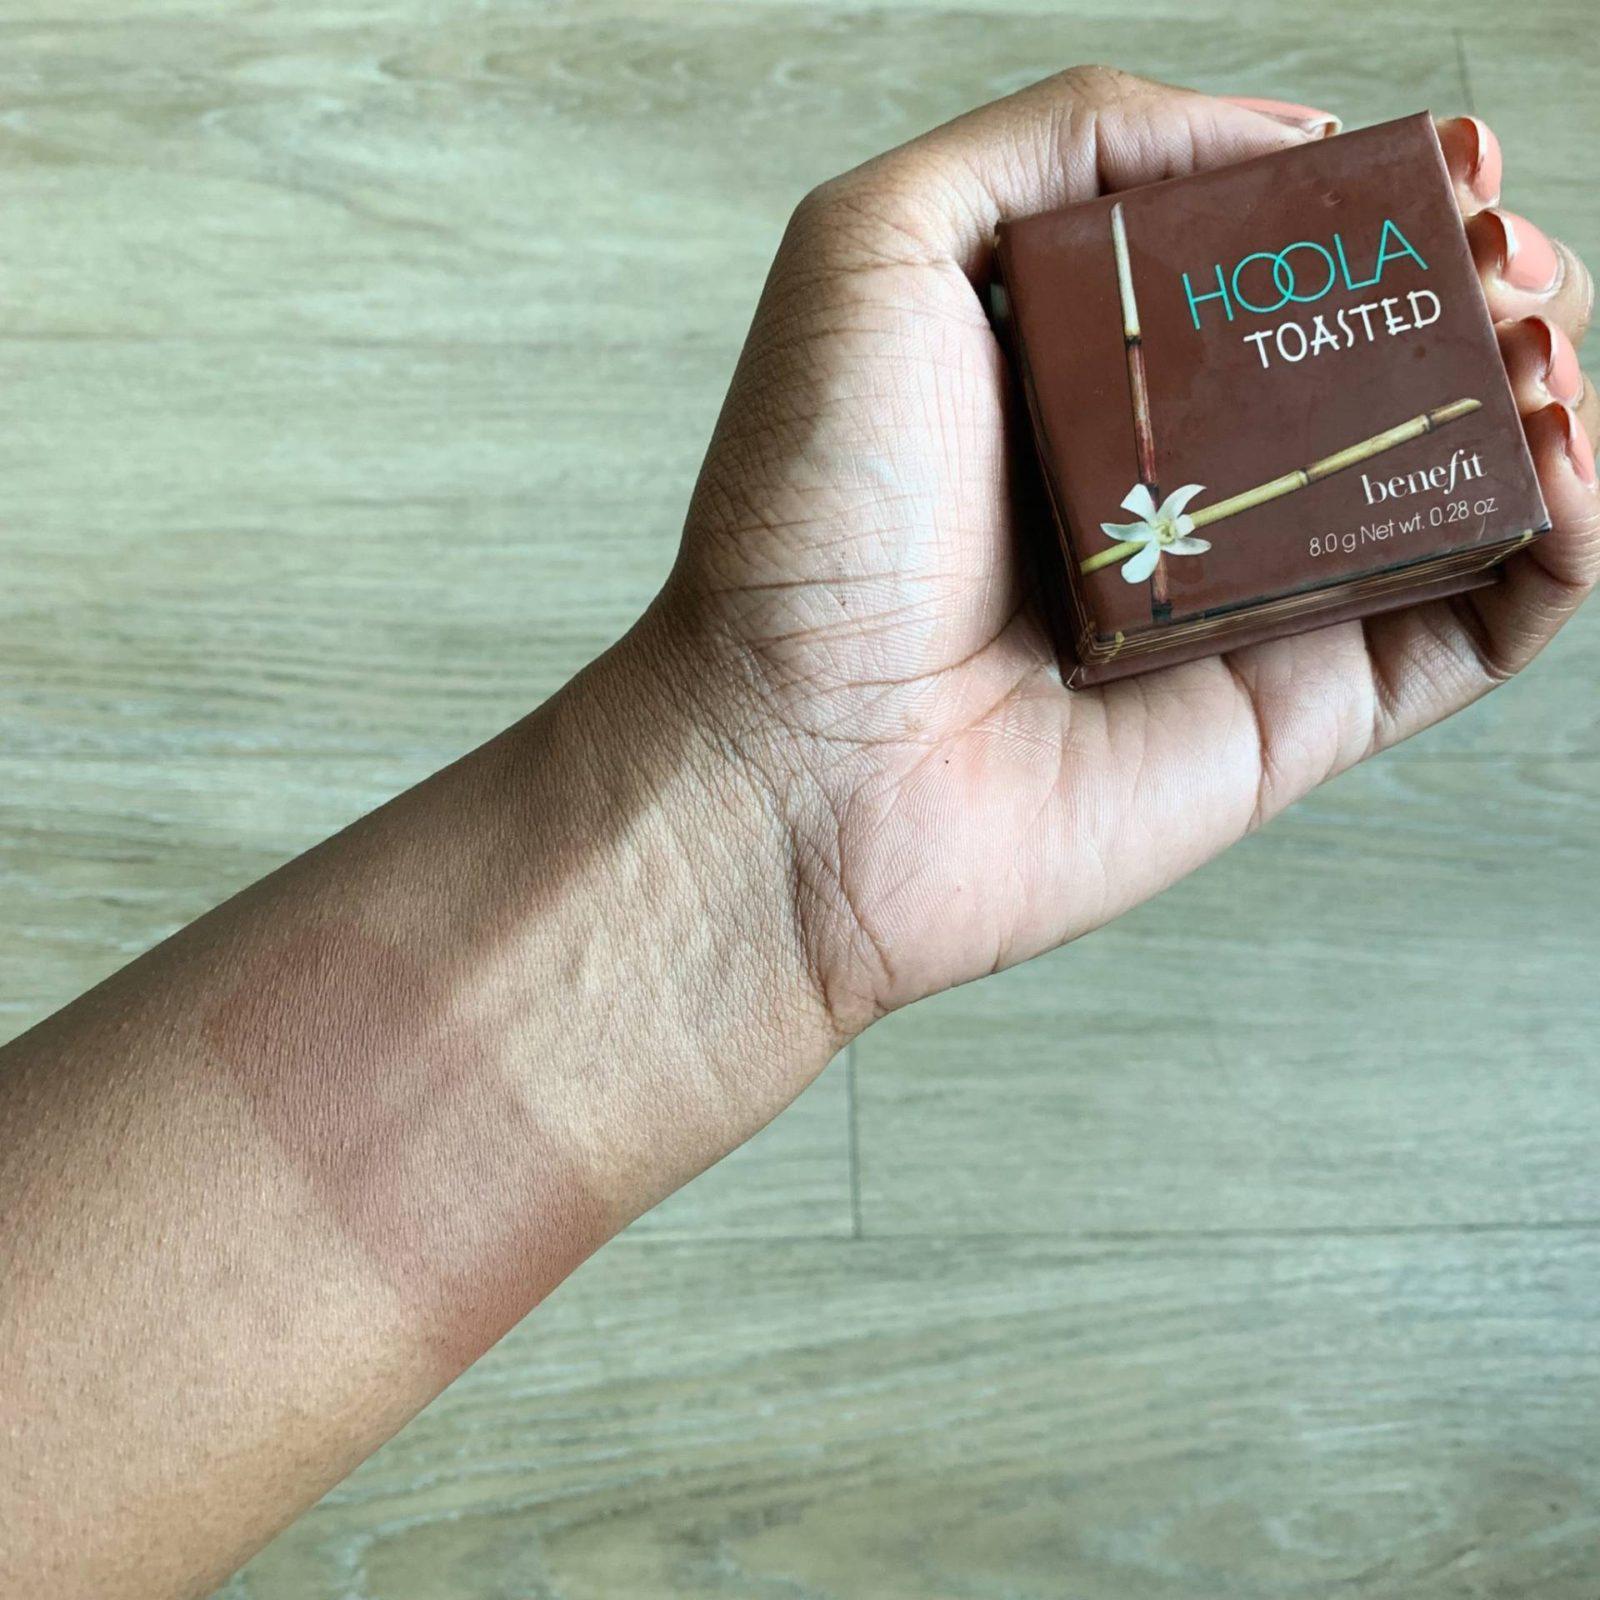 Hoola toasted swatch on dark skin - Le fab chic